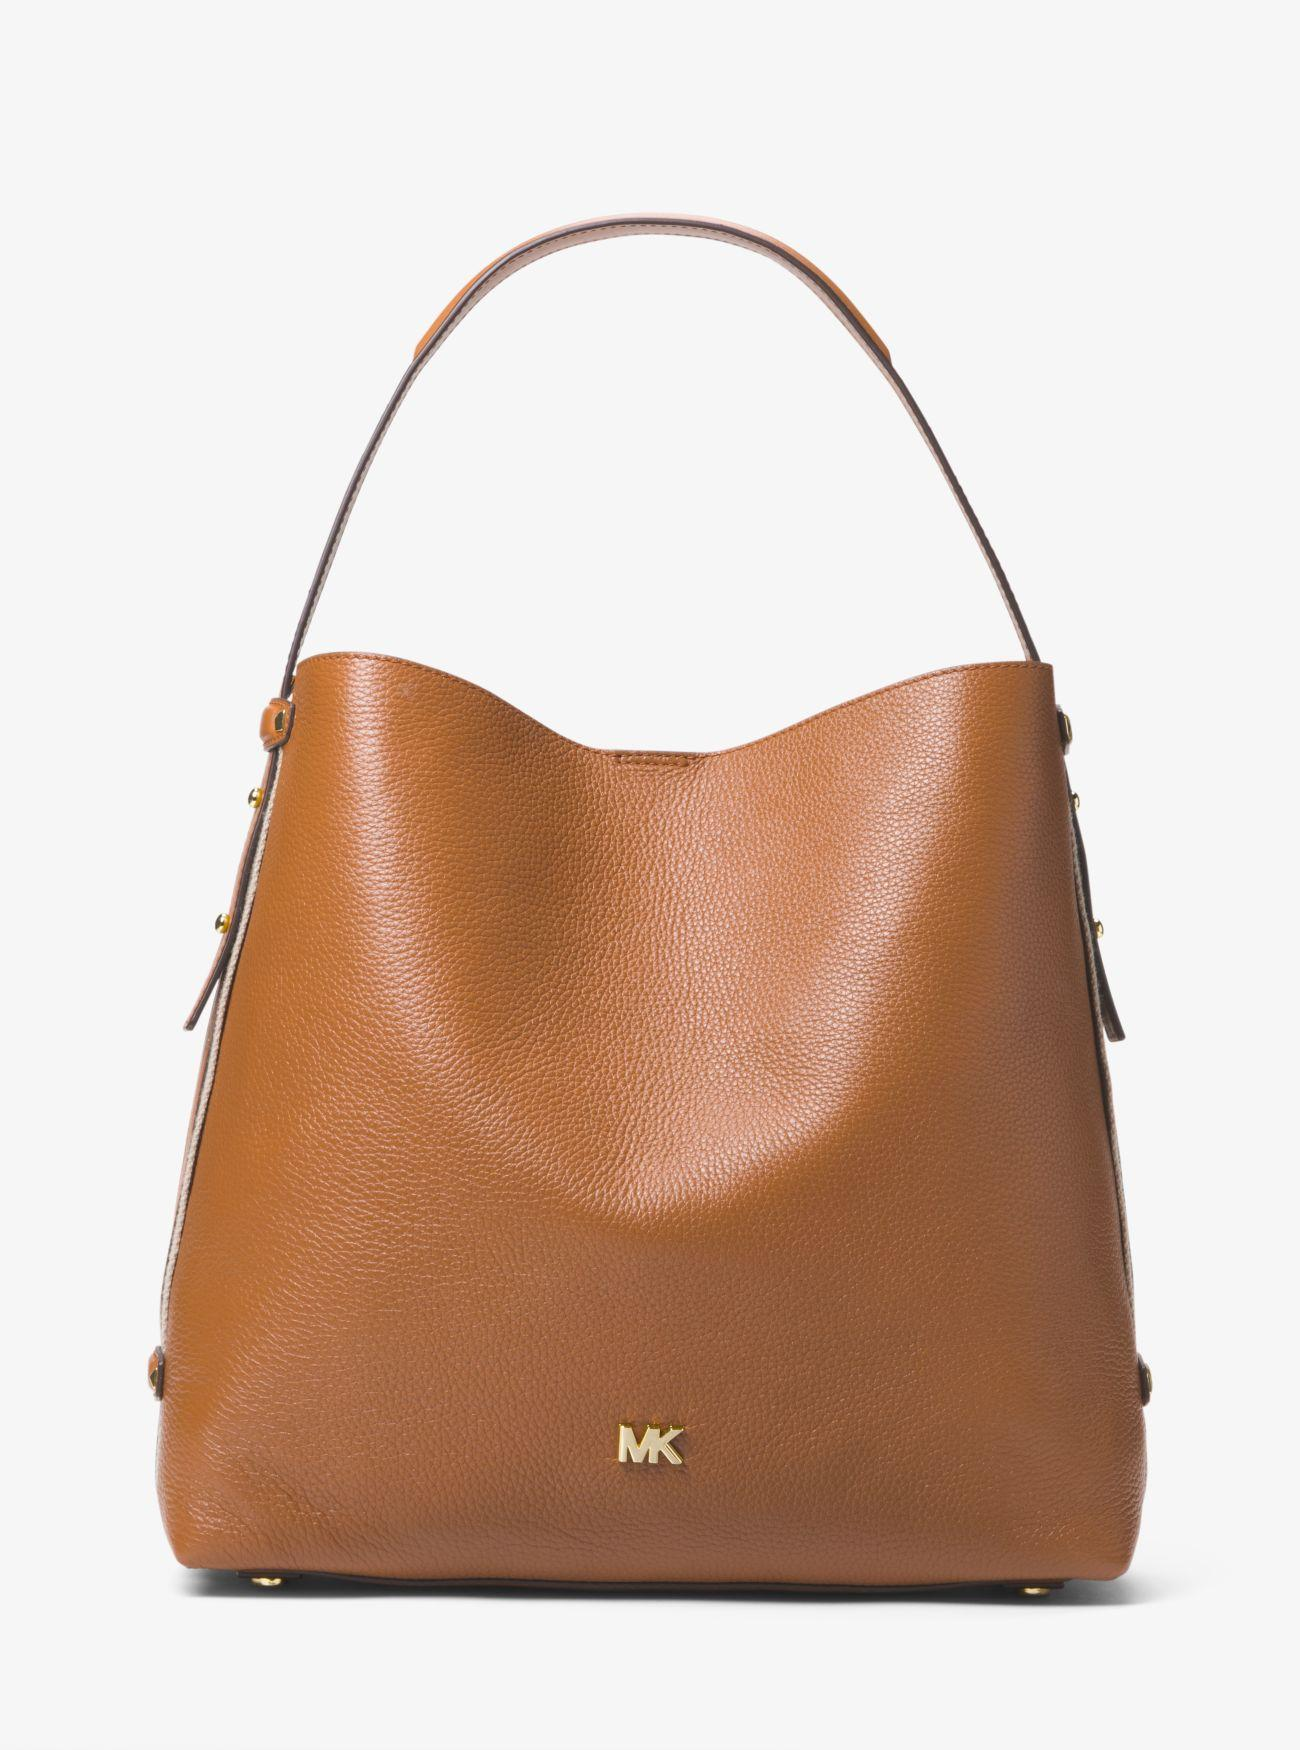 2c4860c81f89 Michael Kors Griffin Large Leather Shoulder Bag in Brown - Lyst